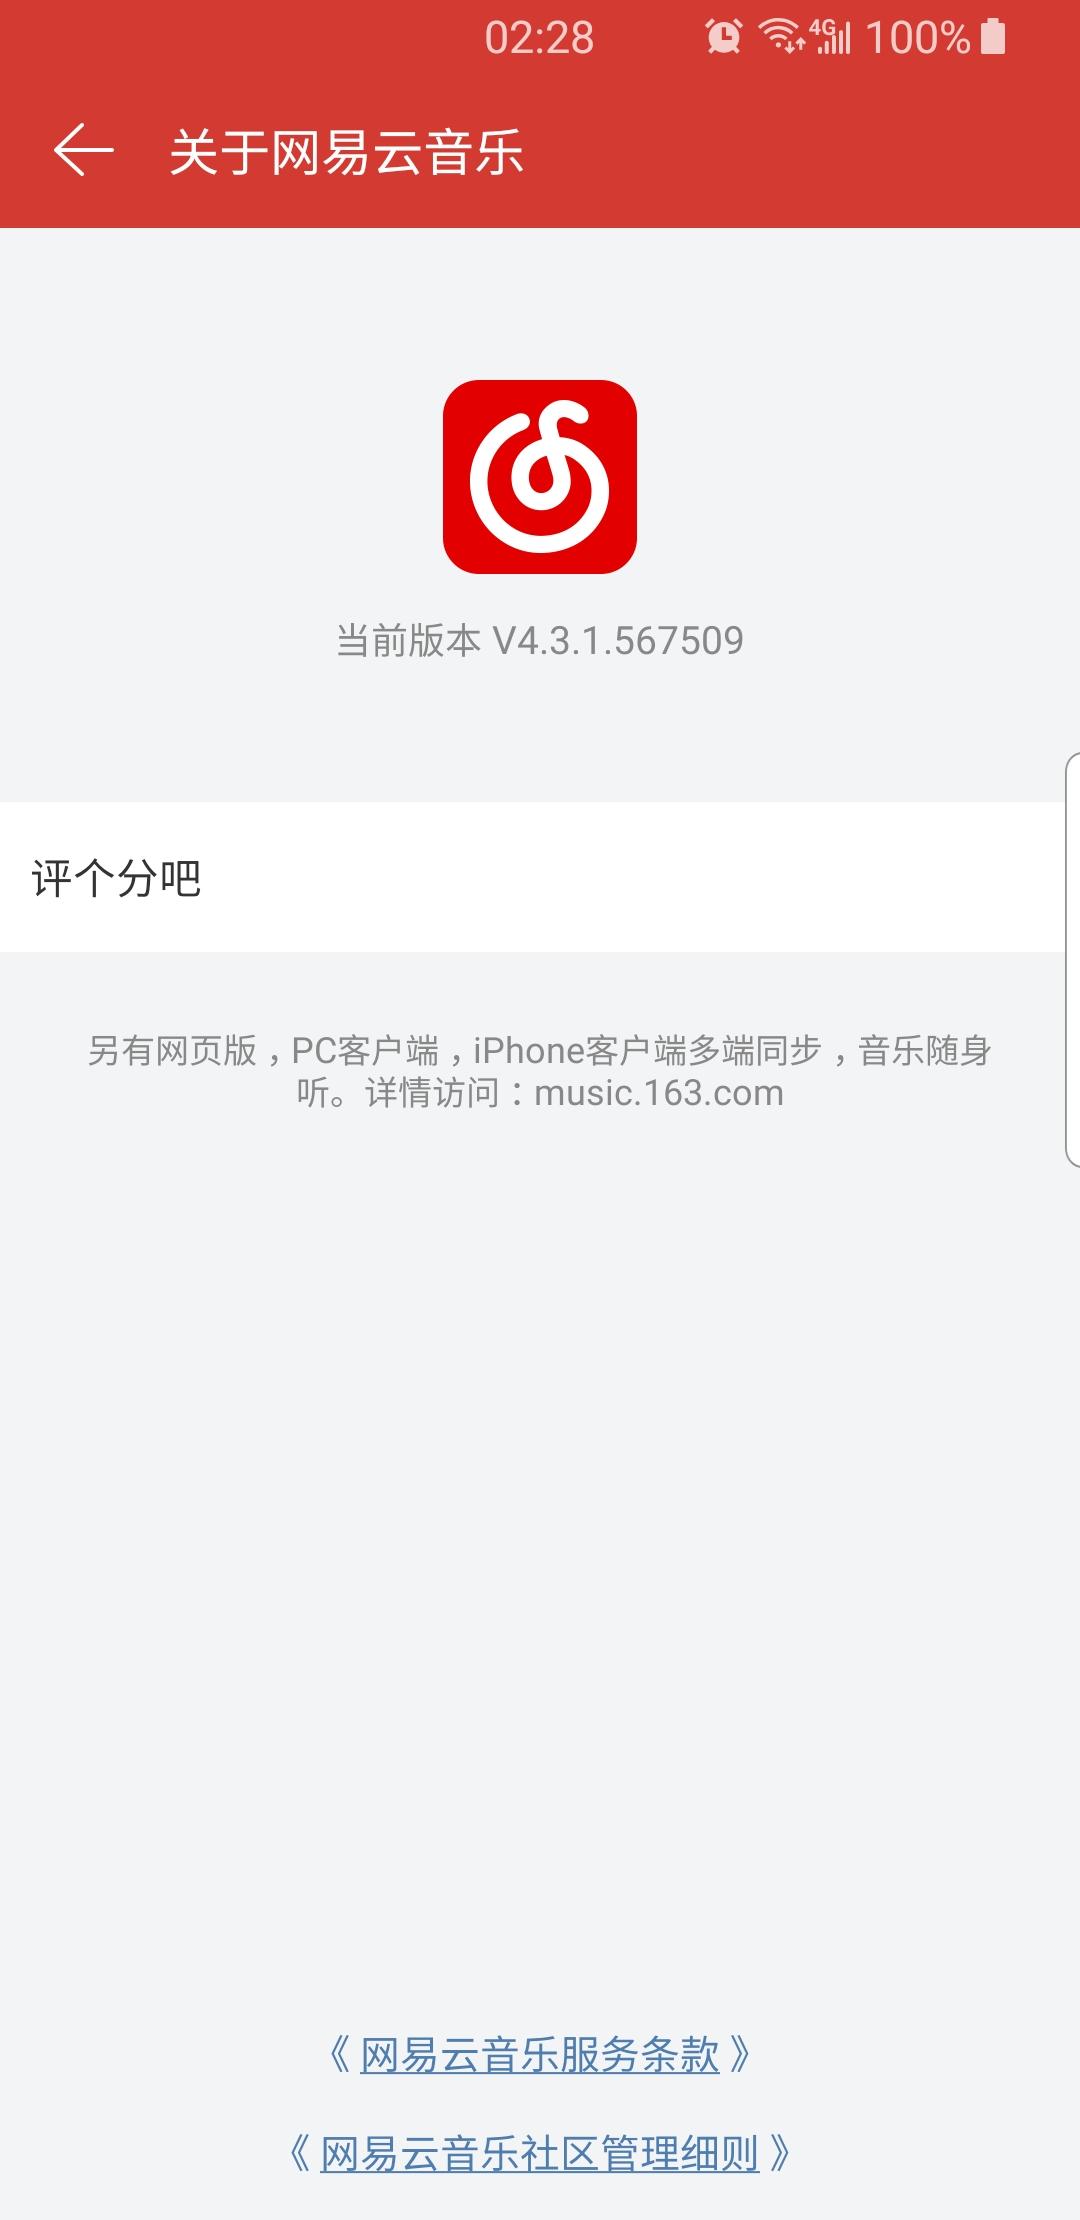 5e4ae2bb5cb70 - Android | 网易云音乐 Google Play 下架前最后一版,无登录广告